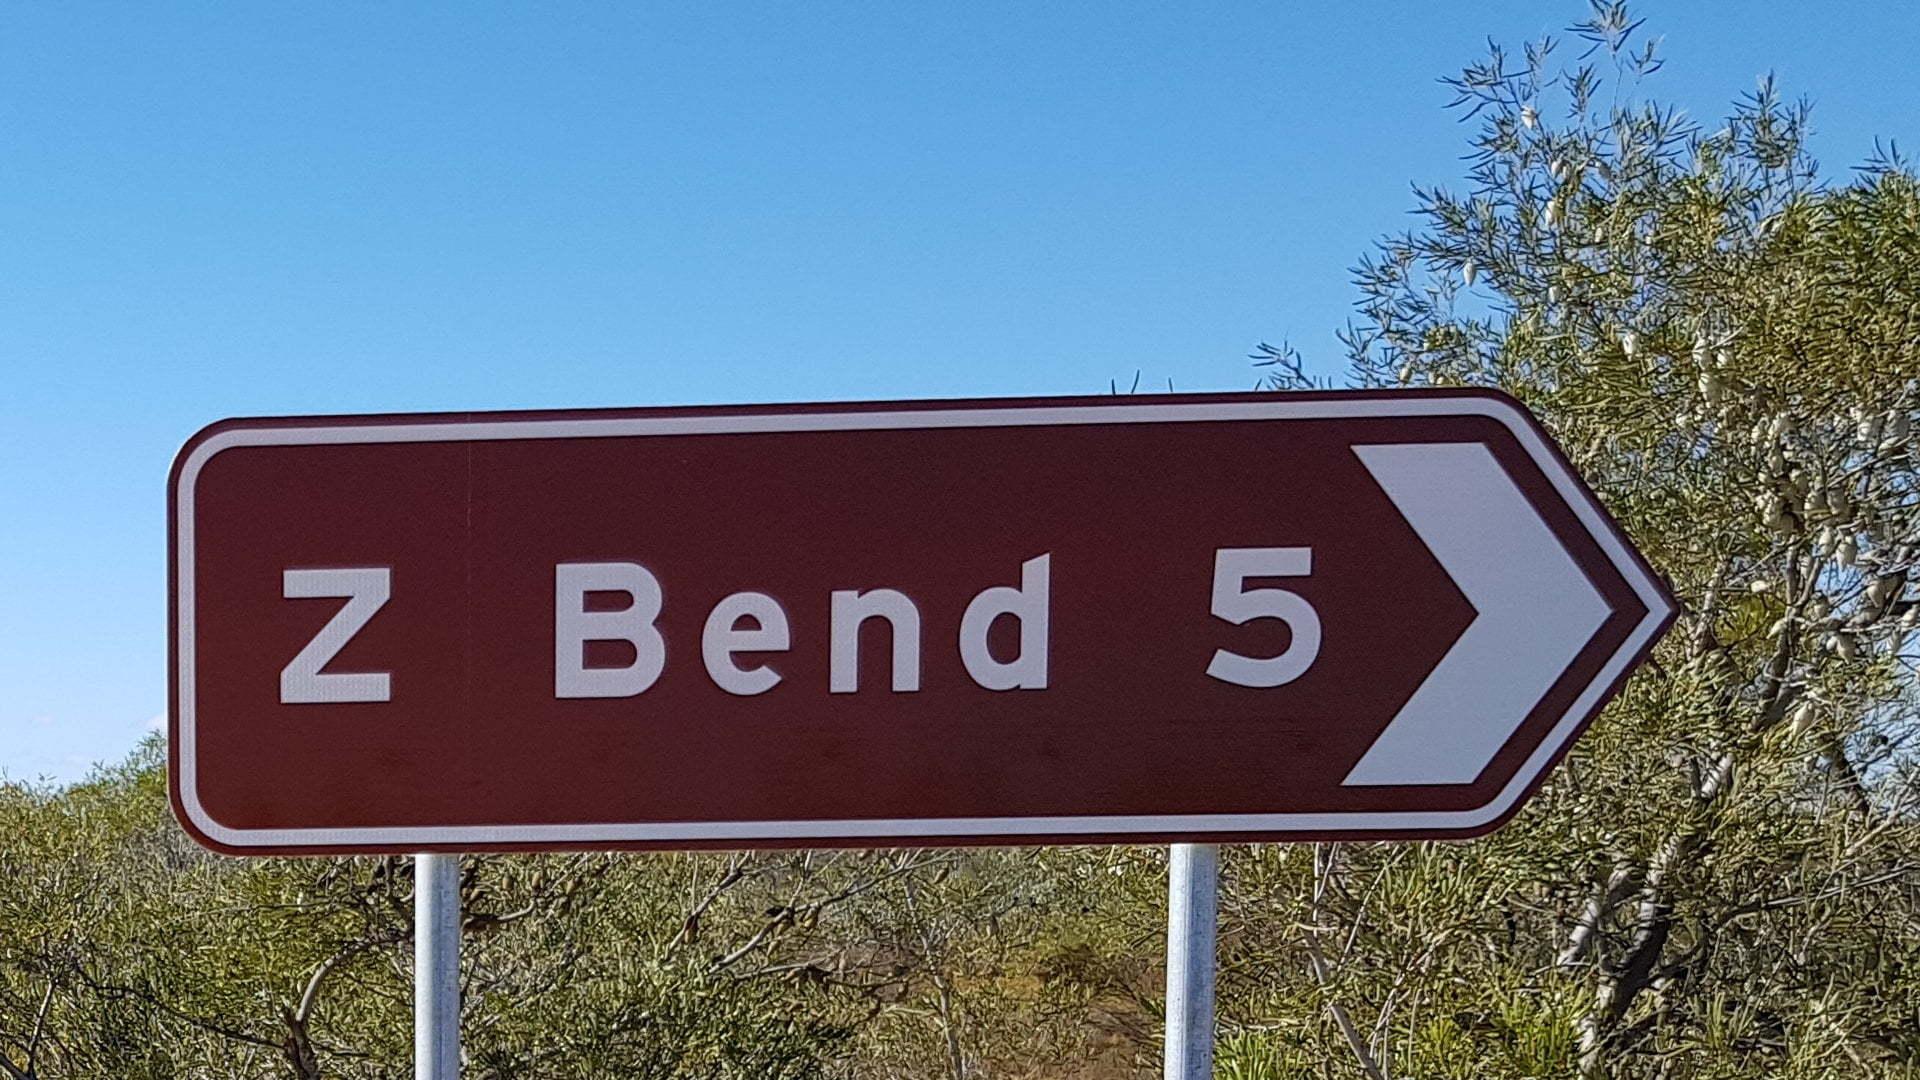 Z Bend brown tourist sign